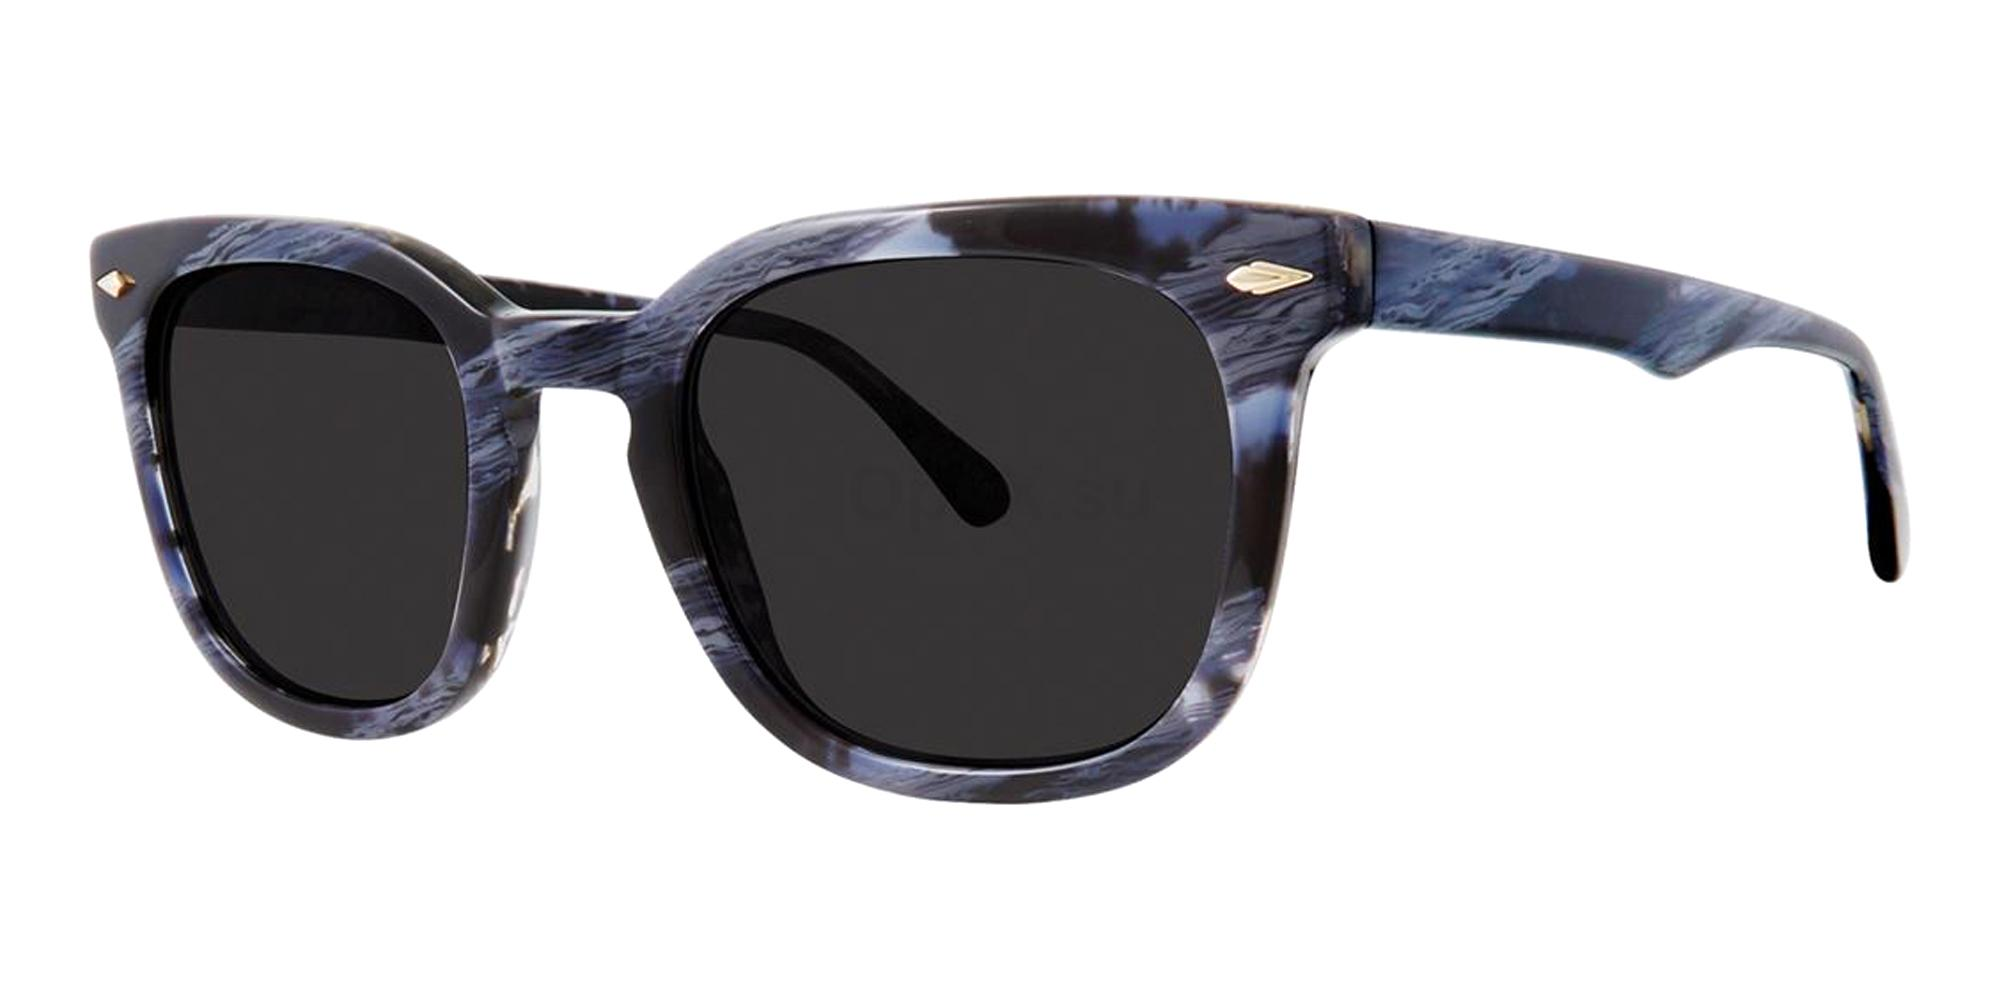 Navy Horn RHETT Sunglasses, Zac Posen